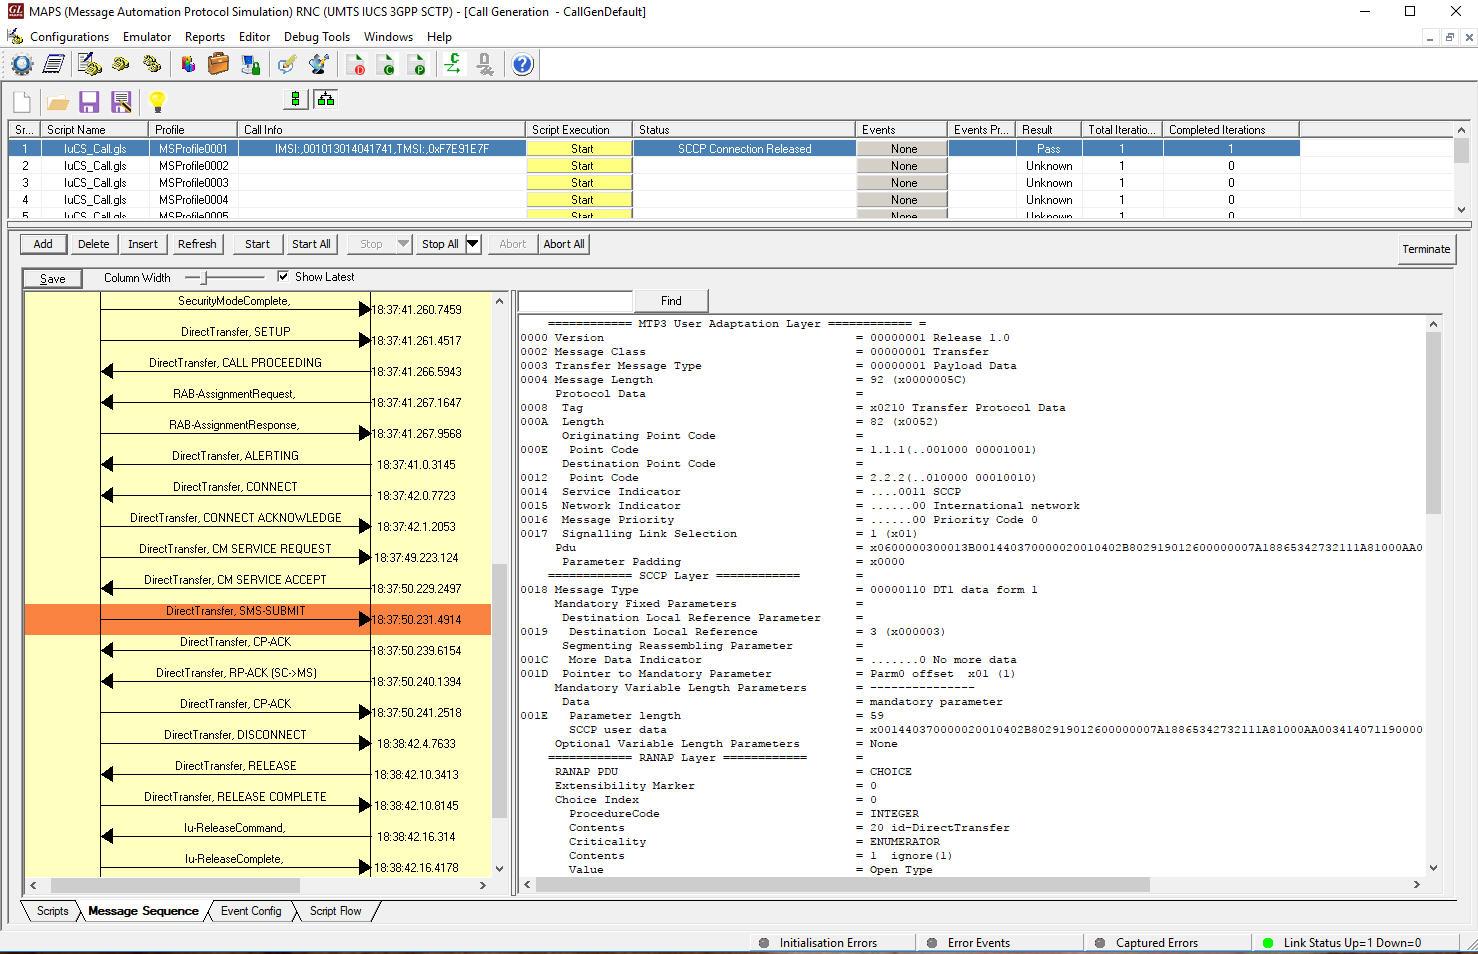 MAPS™ UMTS for IuCS, IuH Interfaces Emulator (IuCS Emulation